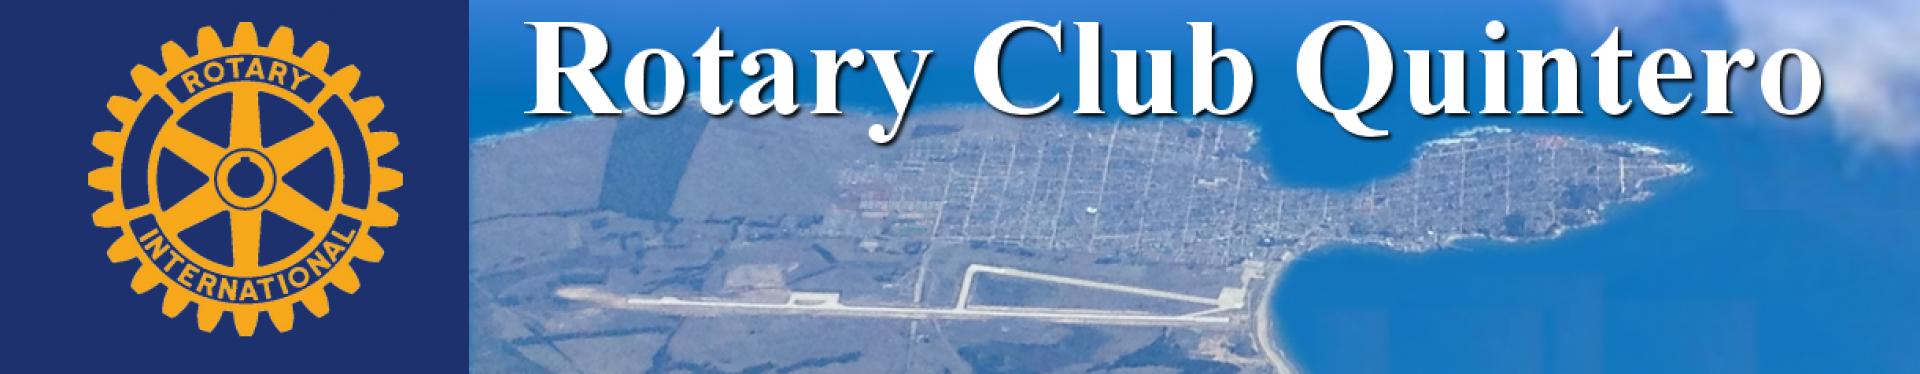 Noticias Rotary Club Quintero